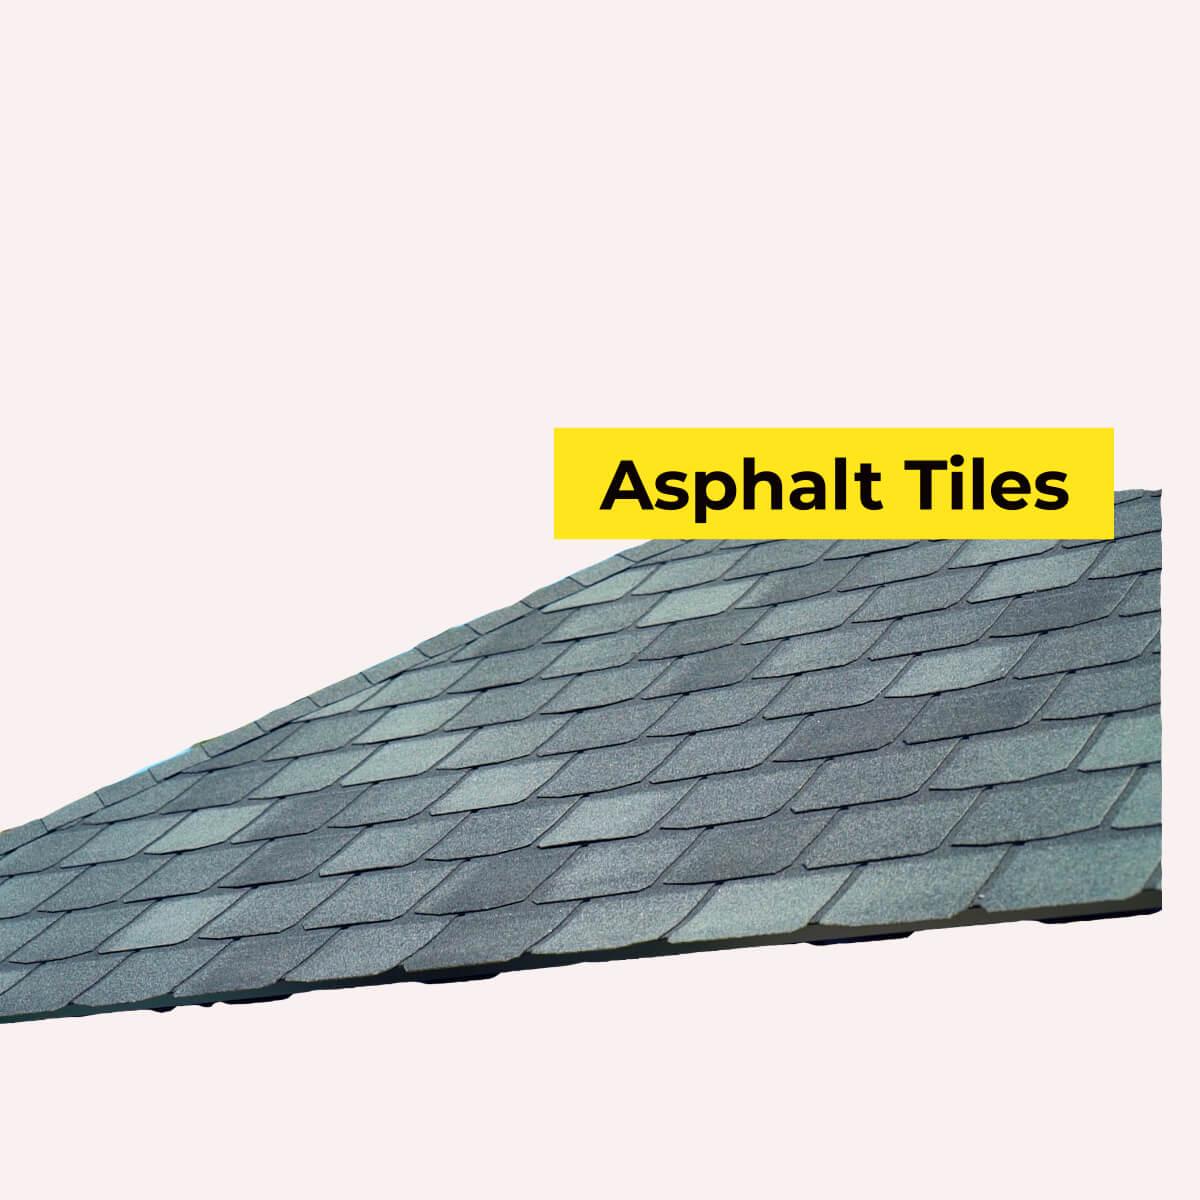 Asphalt Tiles